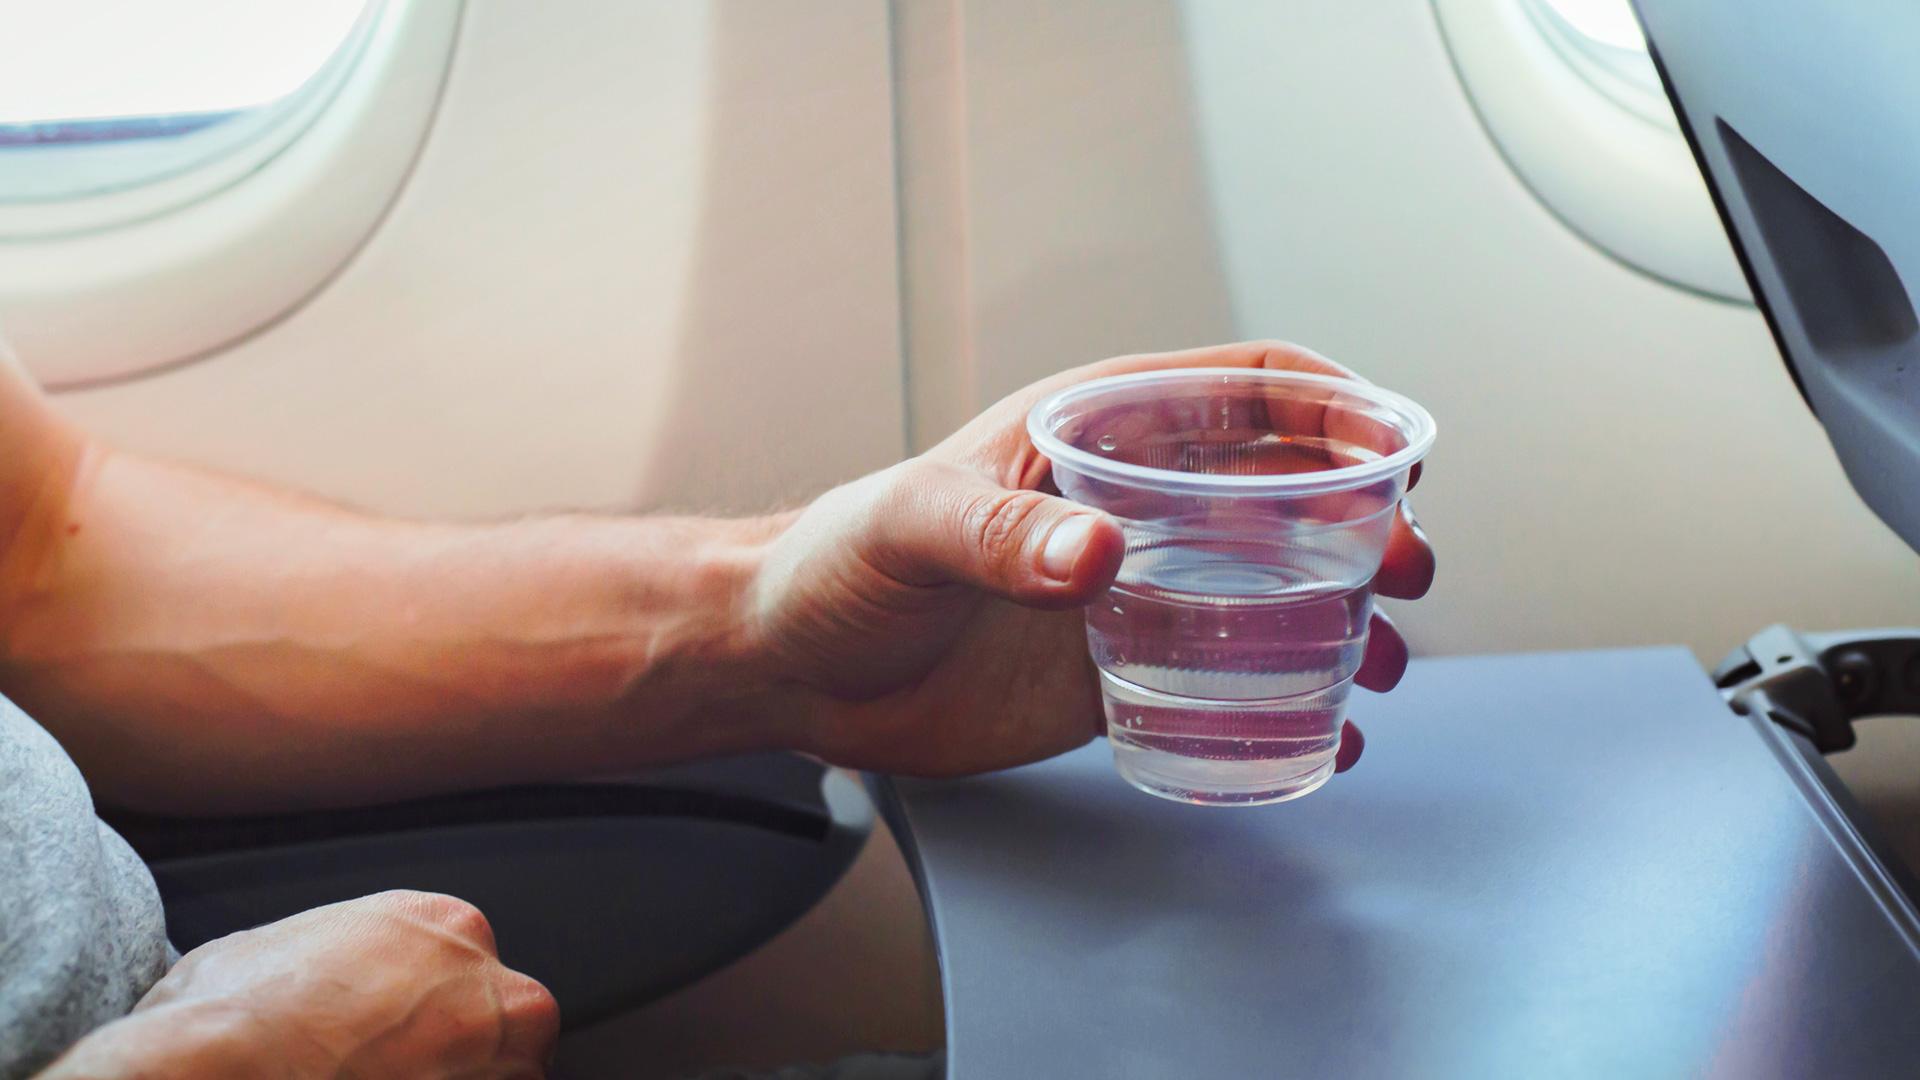 вода в самолете